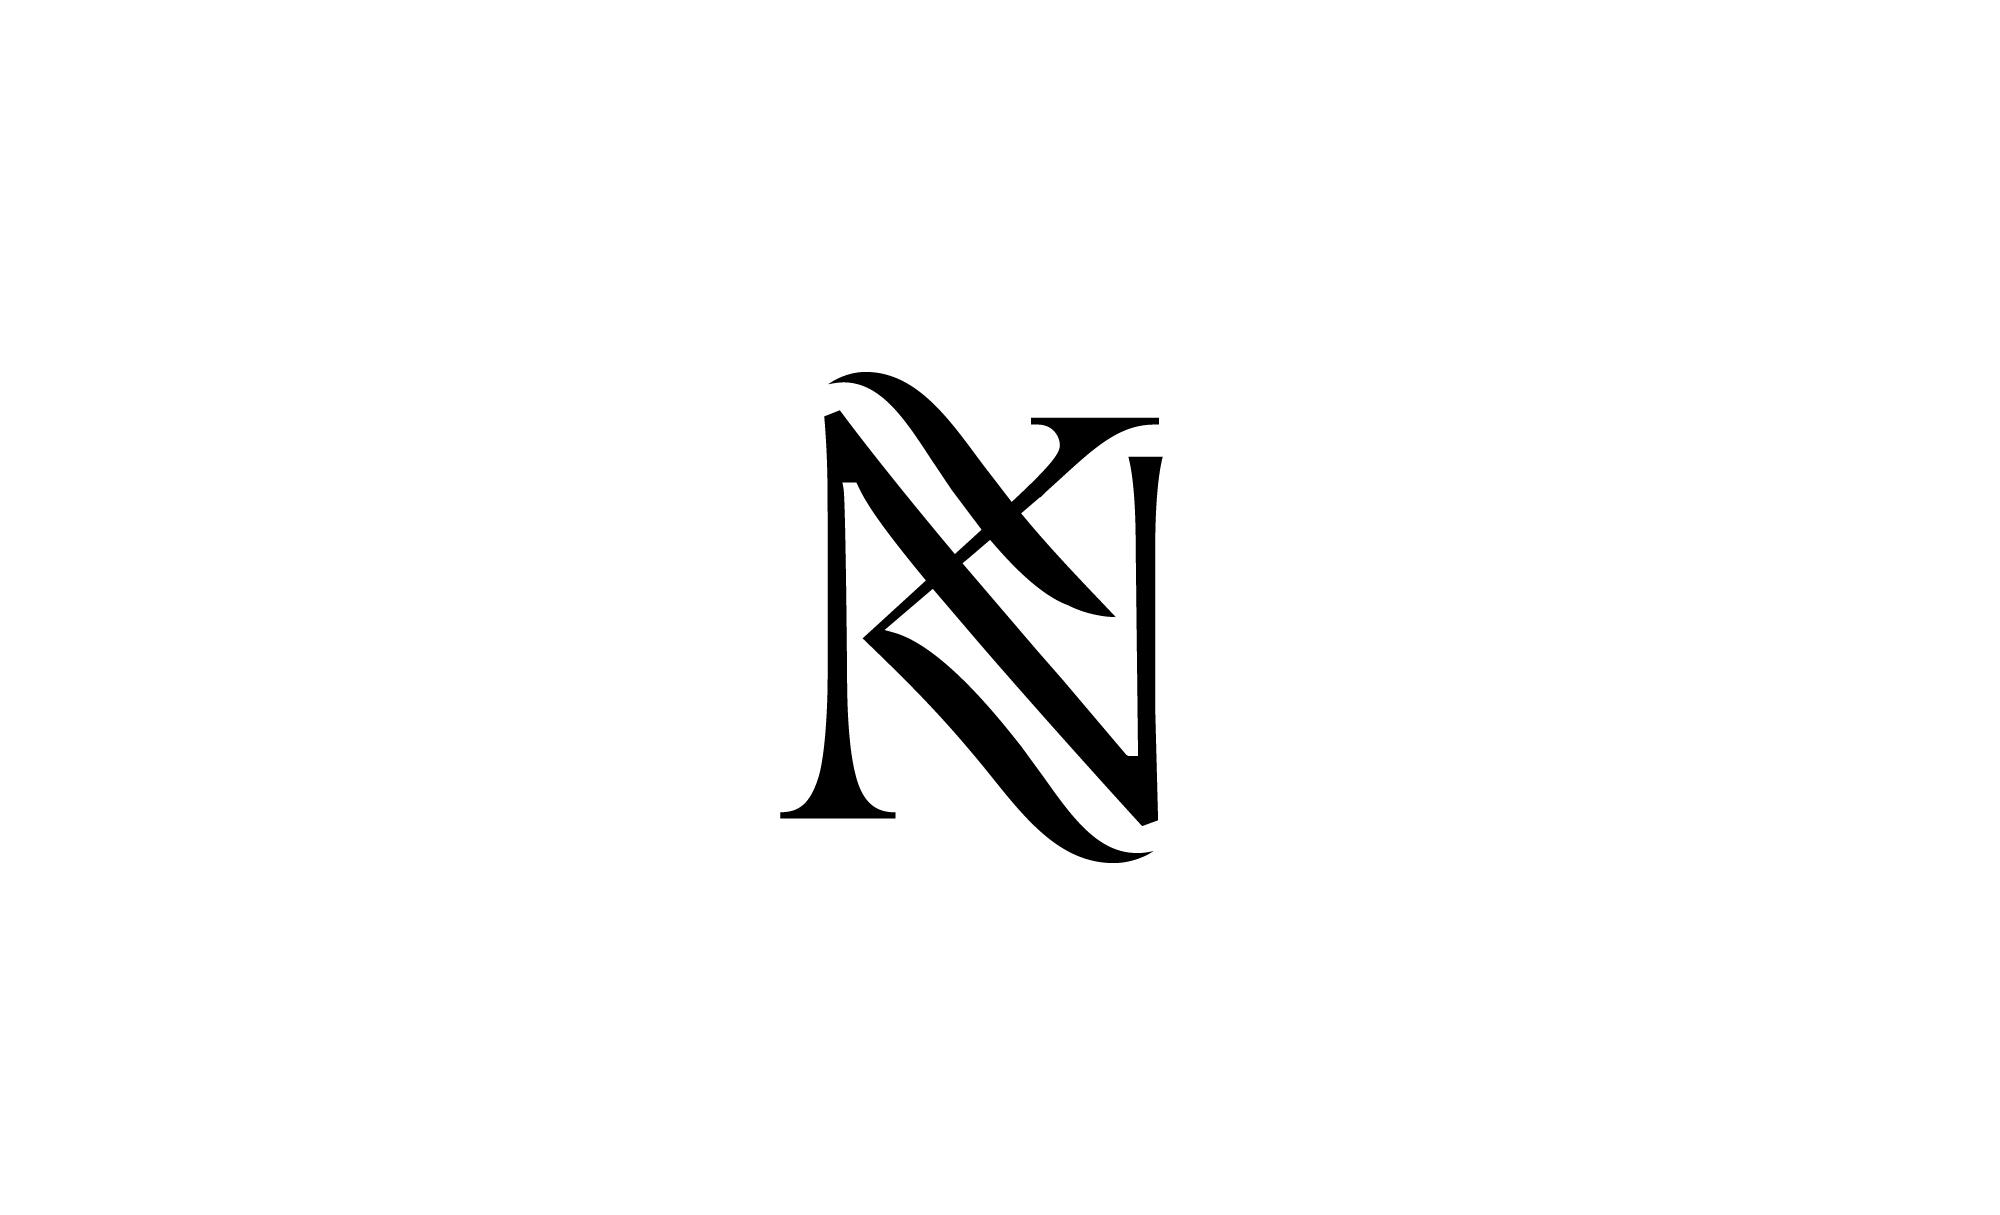 Персональный знак NK